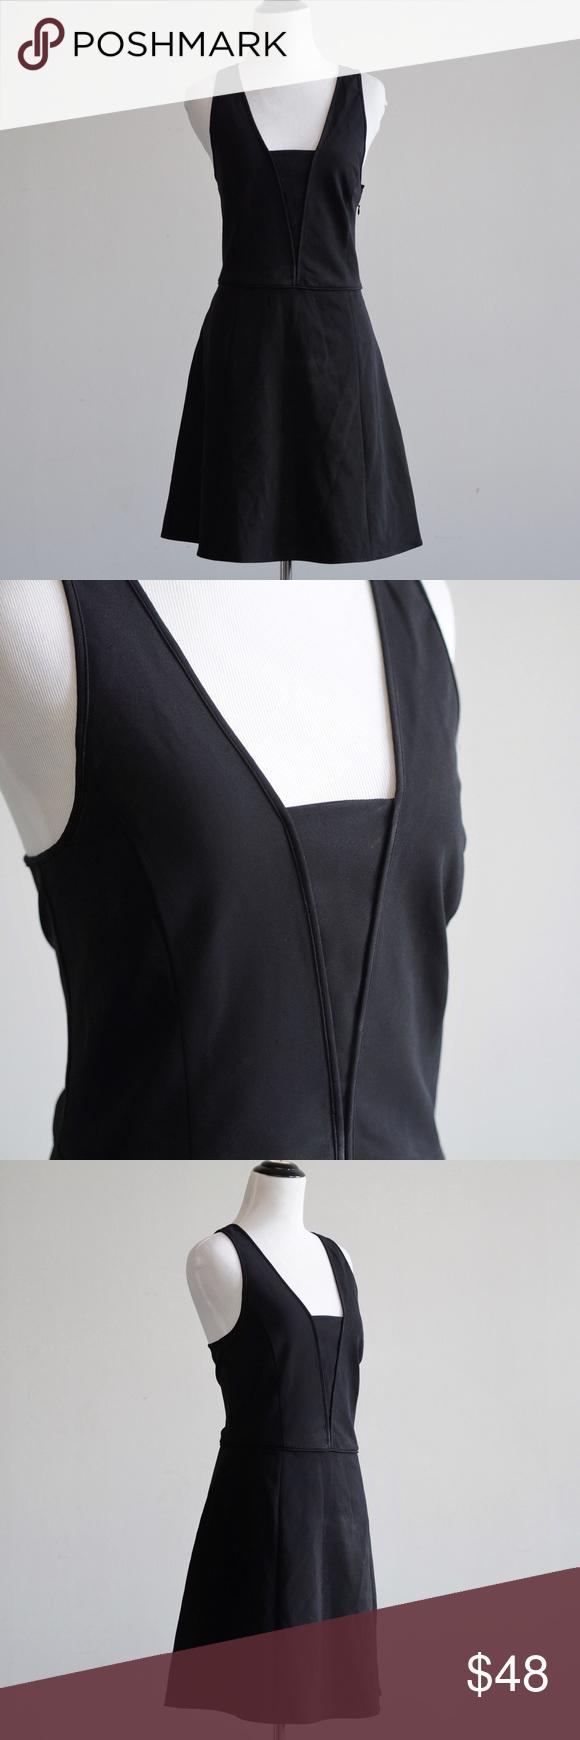 Theory Dress Black 12 Theory Dress •size 12 •black •criss cross straps in the back •zip closure on back •EUC Theory Dresses Midi #blacksleevelessdress